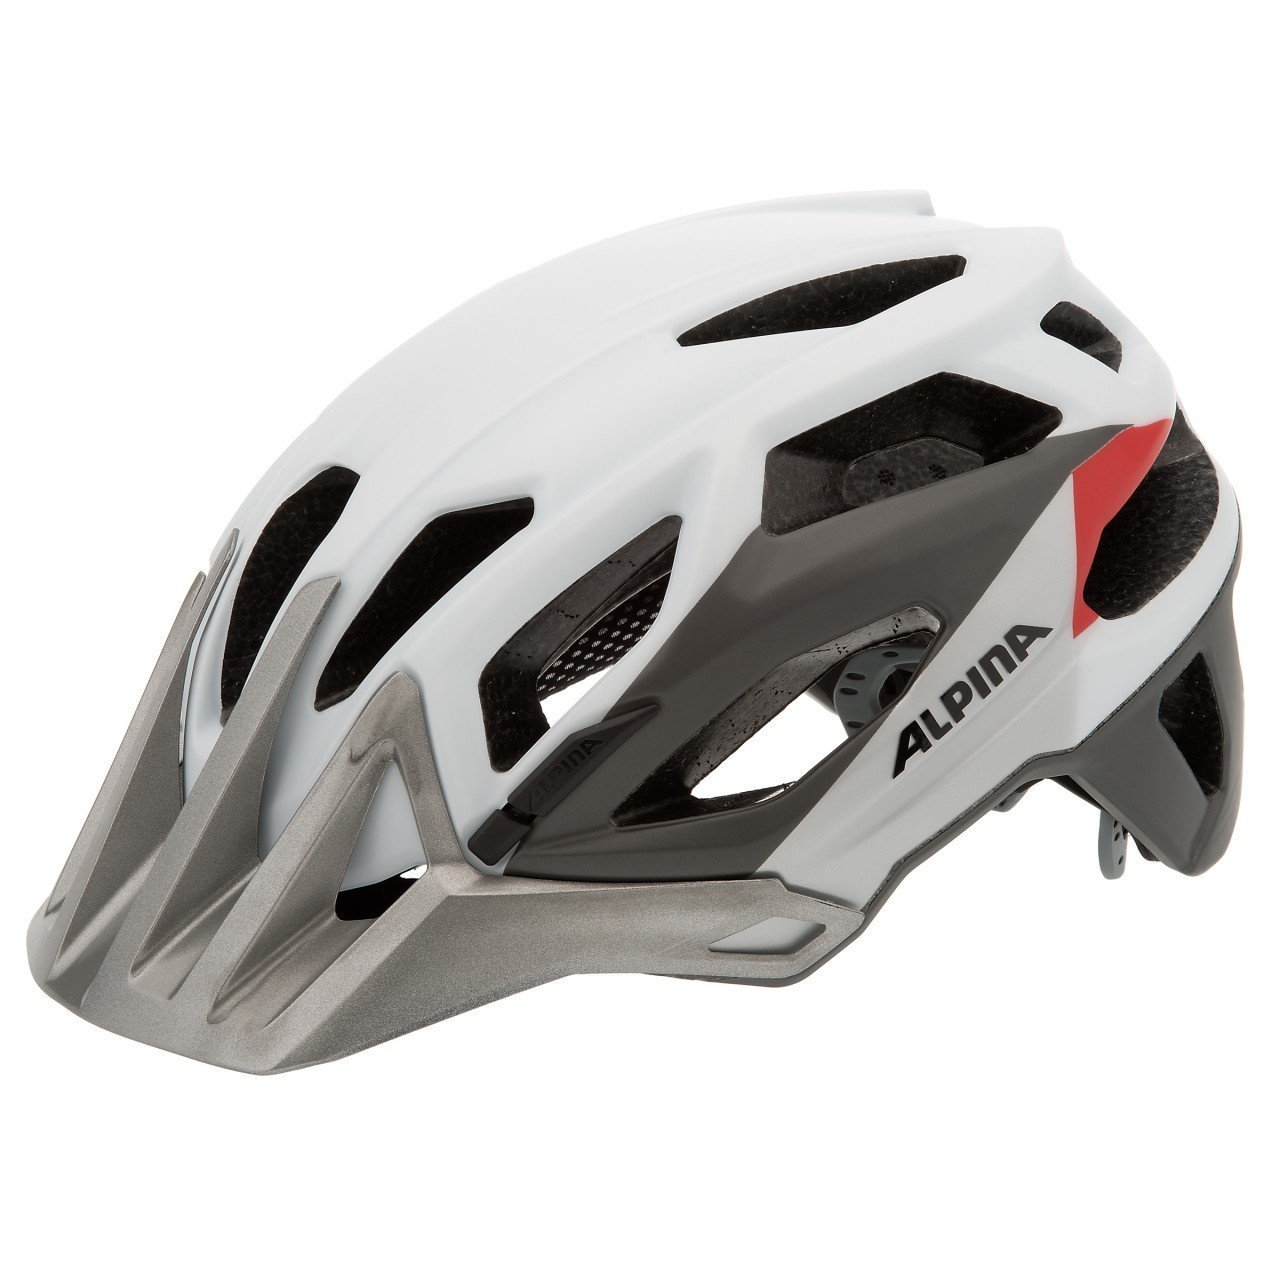 Купить Летний шлем Alpina Enduro Garbanzo white-silver-red, Шлемы велосипедные, 1179851